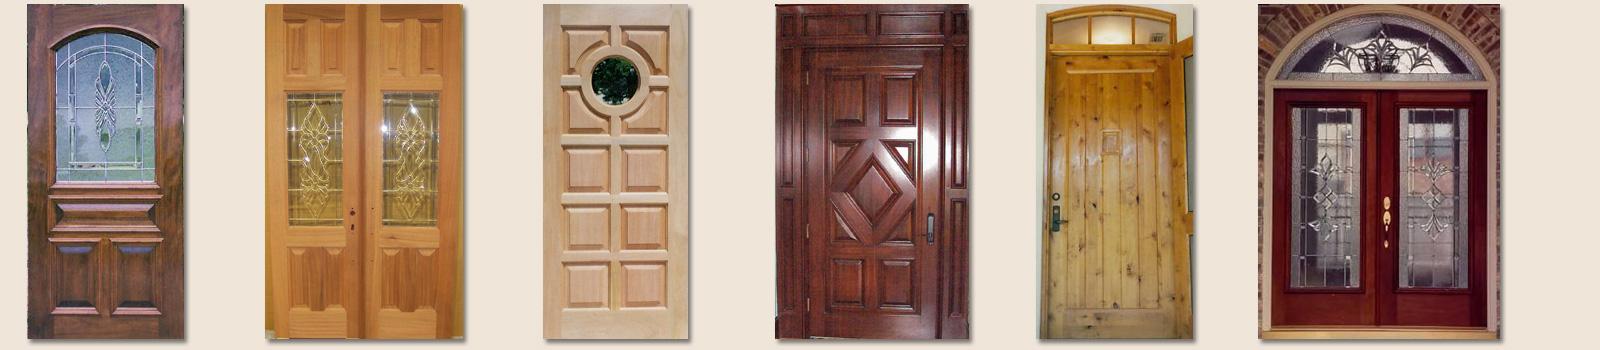 Mesmerizing wooden doors and windows online ideas plan for Custom wood windows online